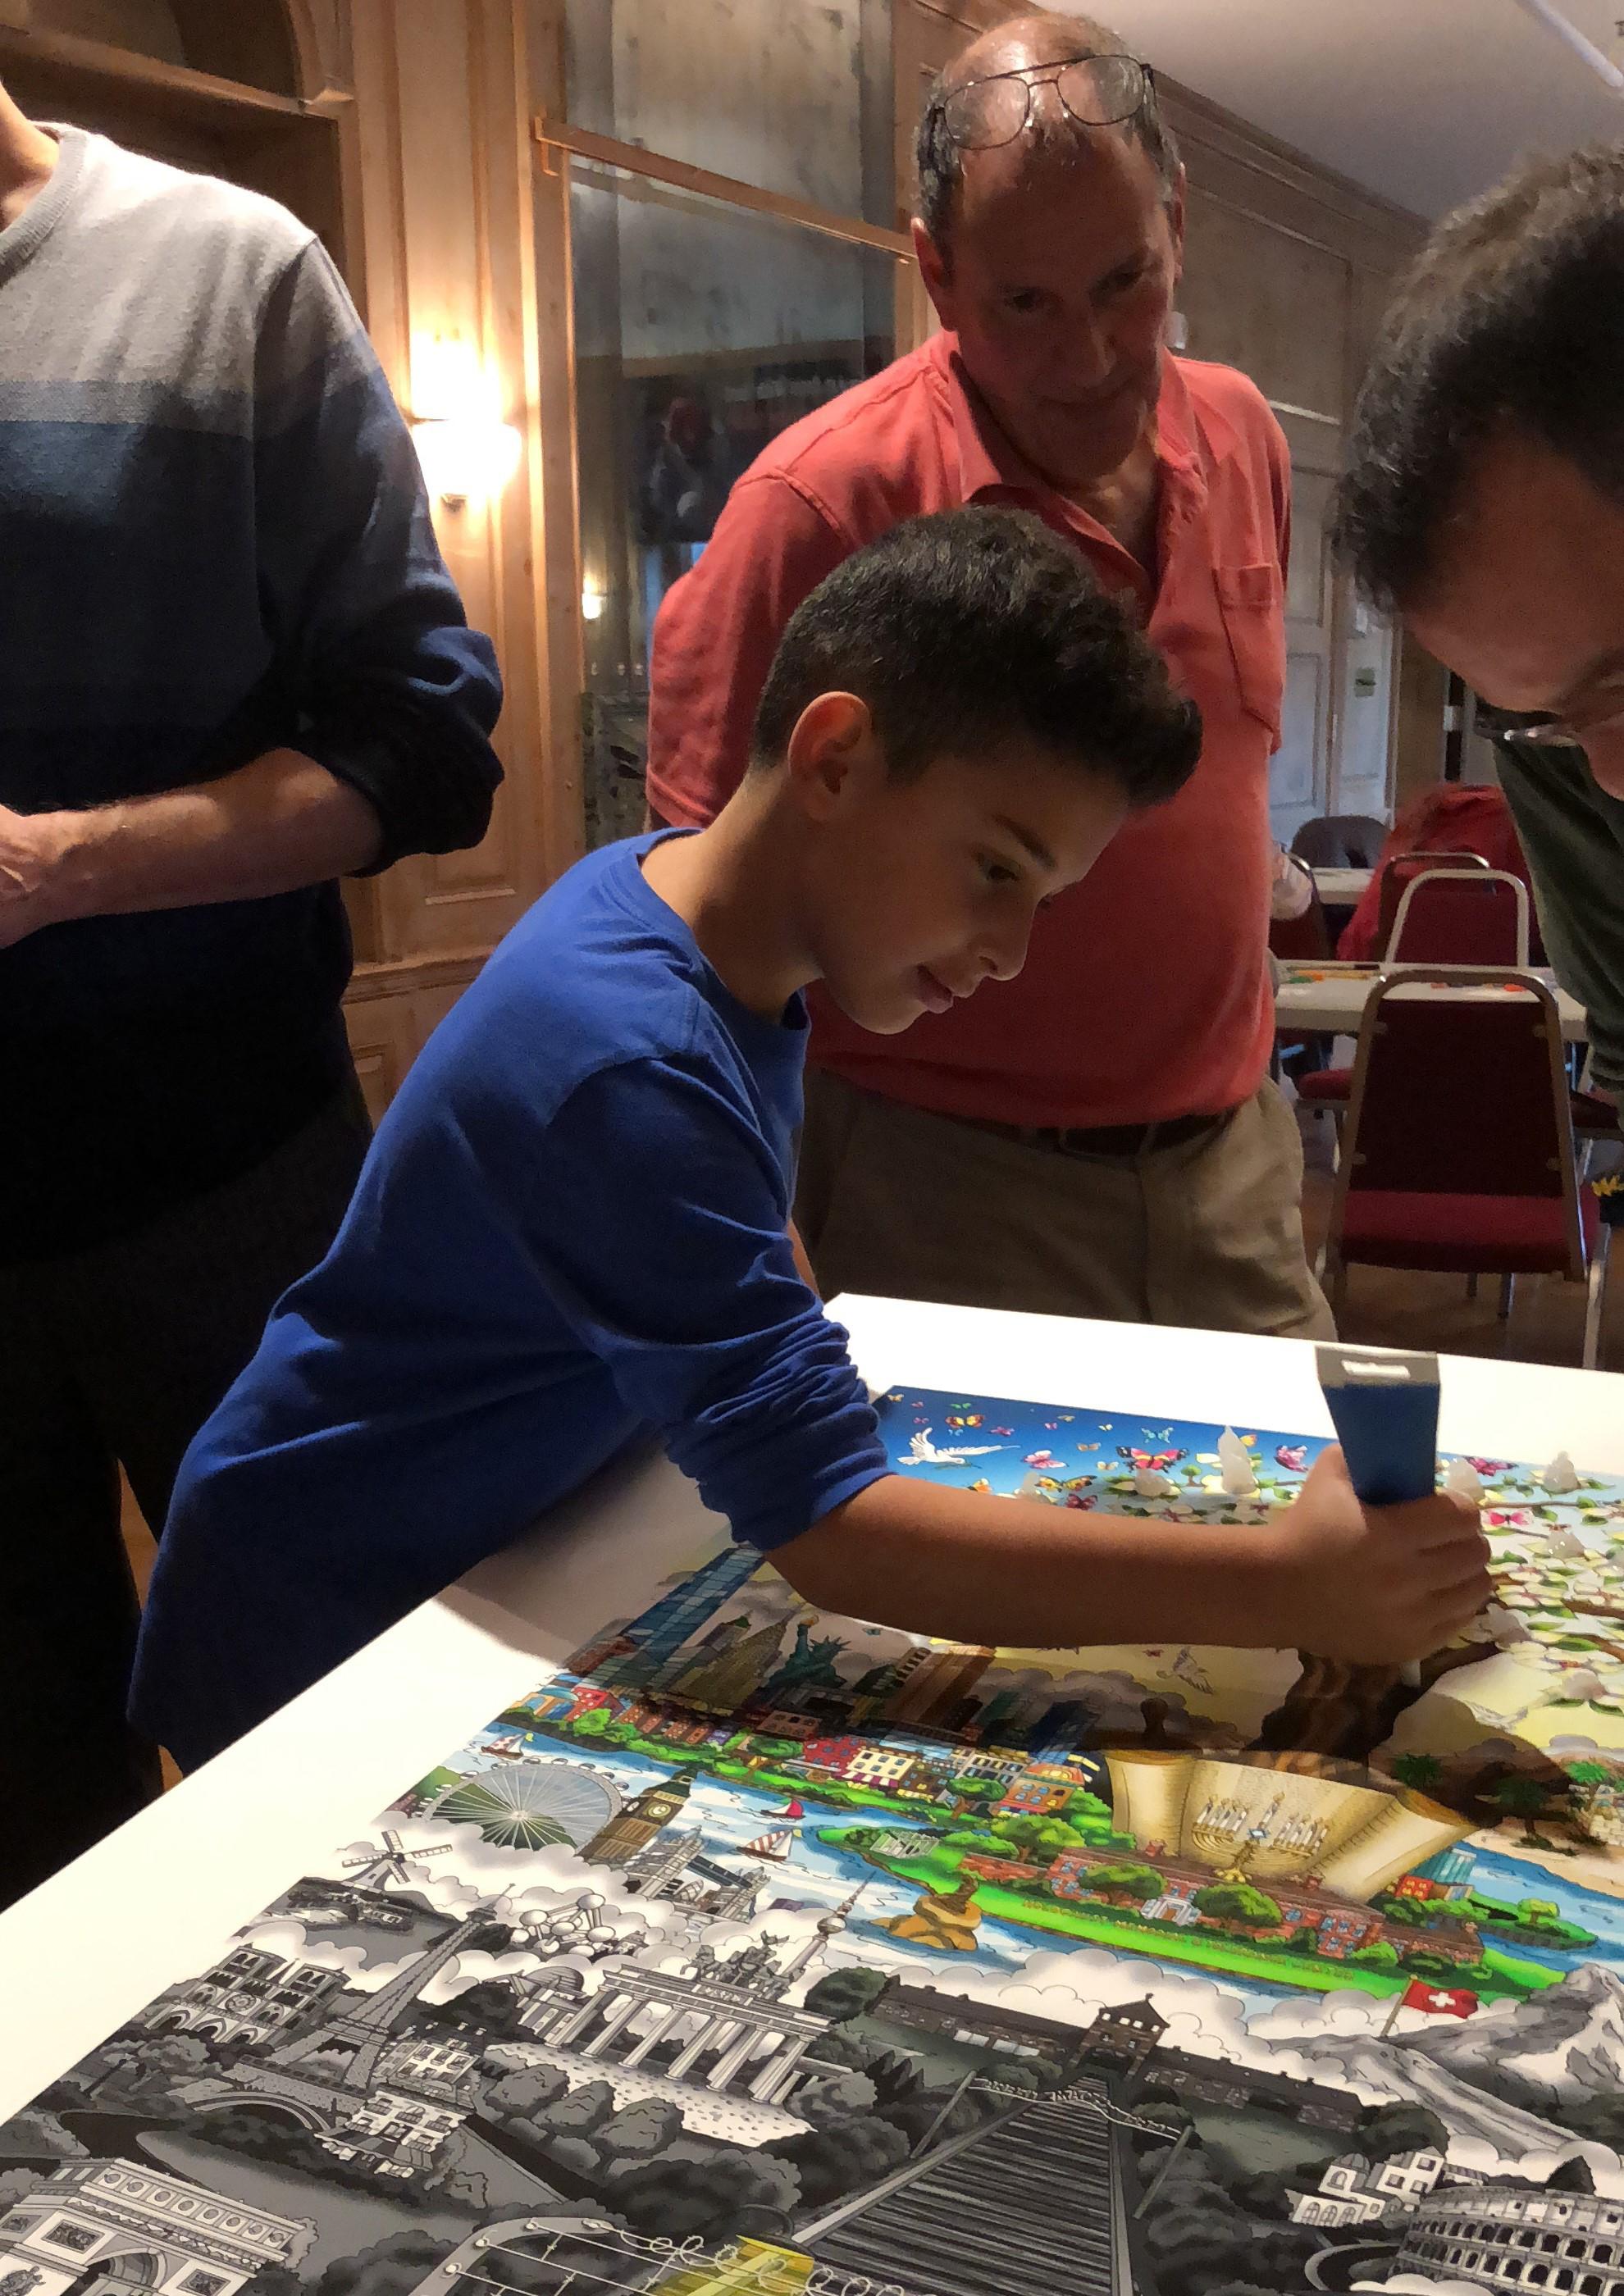 Young boy in a blue shirt adding glue dots to create 3d pop art